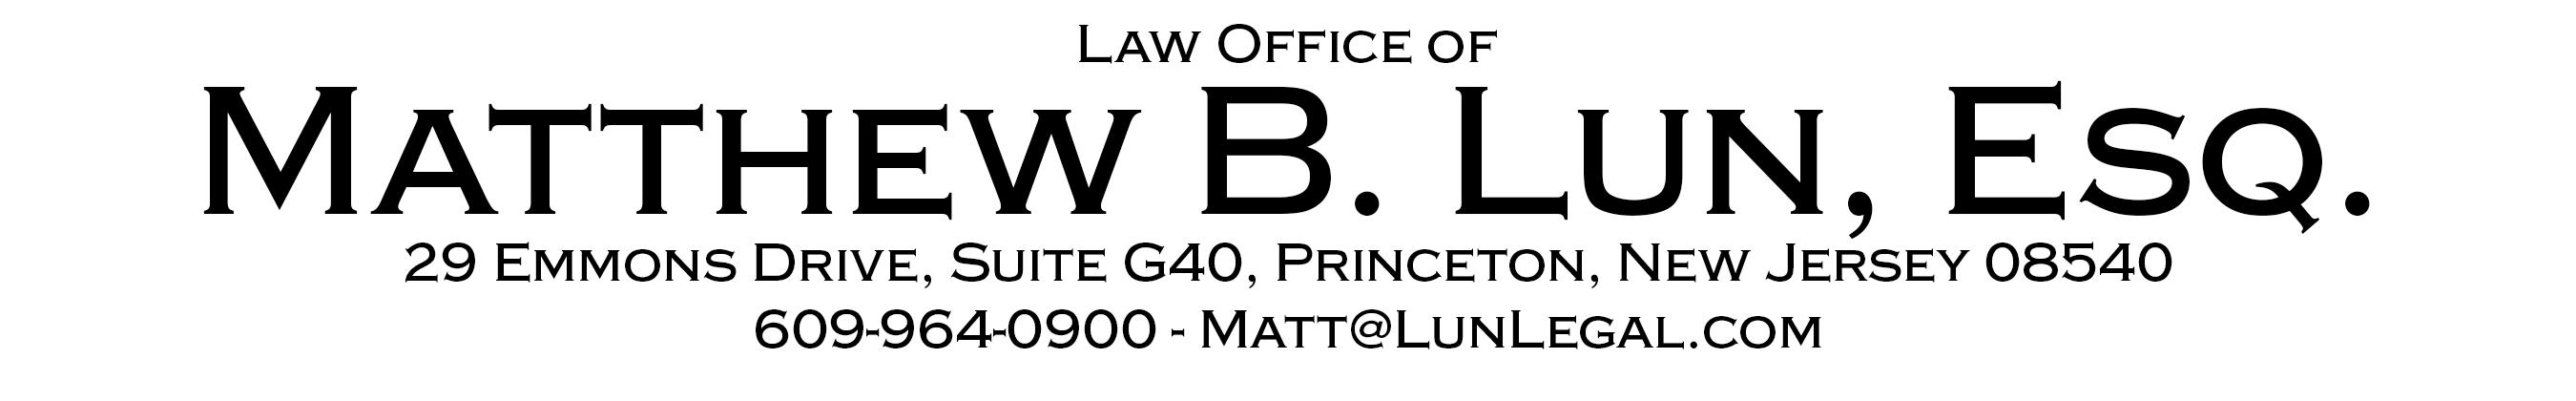 NJ Gun Permit Process - Law Office of Matthew B. LunLaw Office of ...